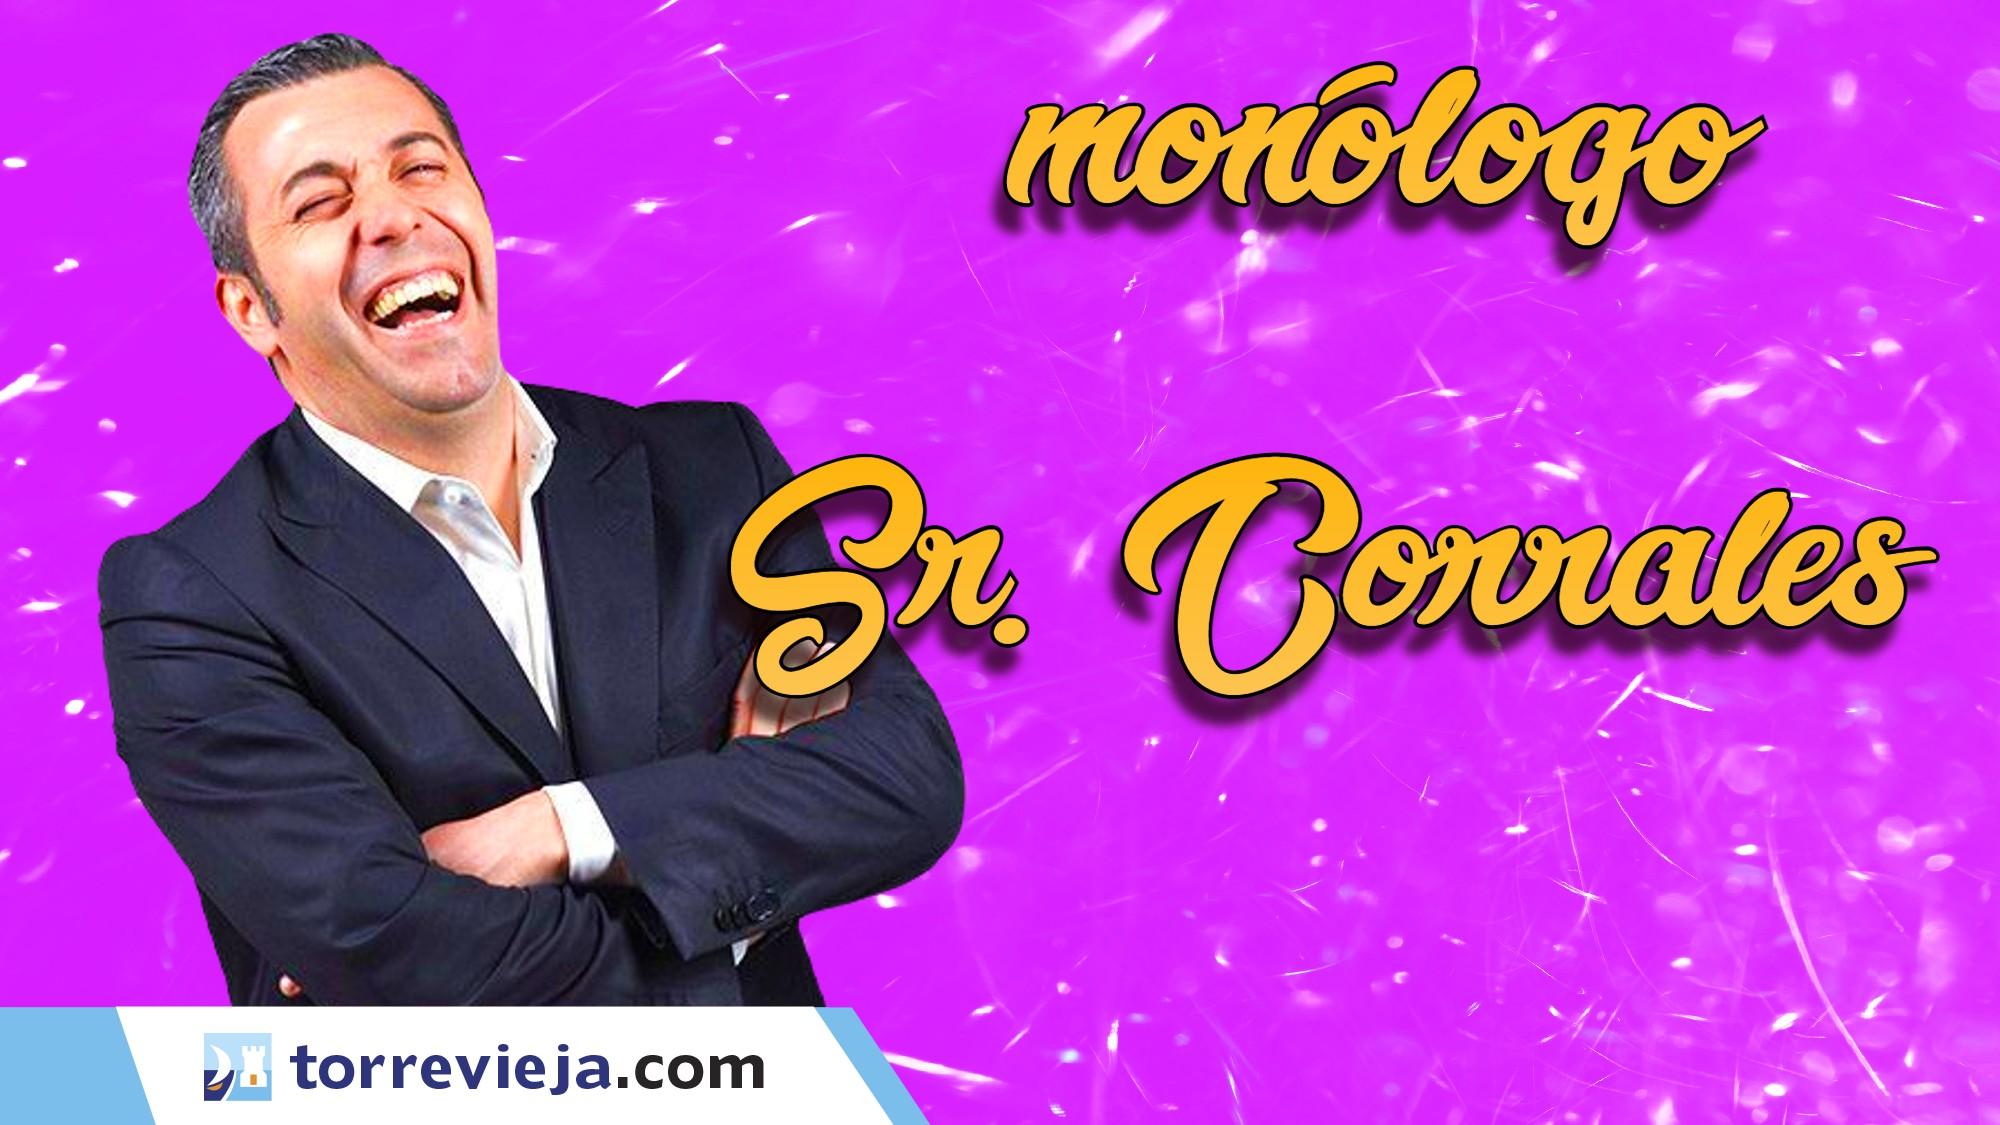 Señor-Corrales-monologo-Torreviejacom-restaurante-insaciable2